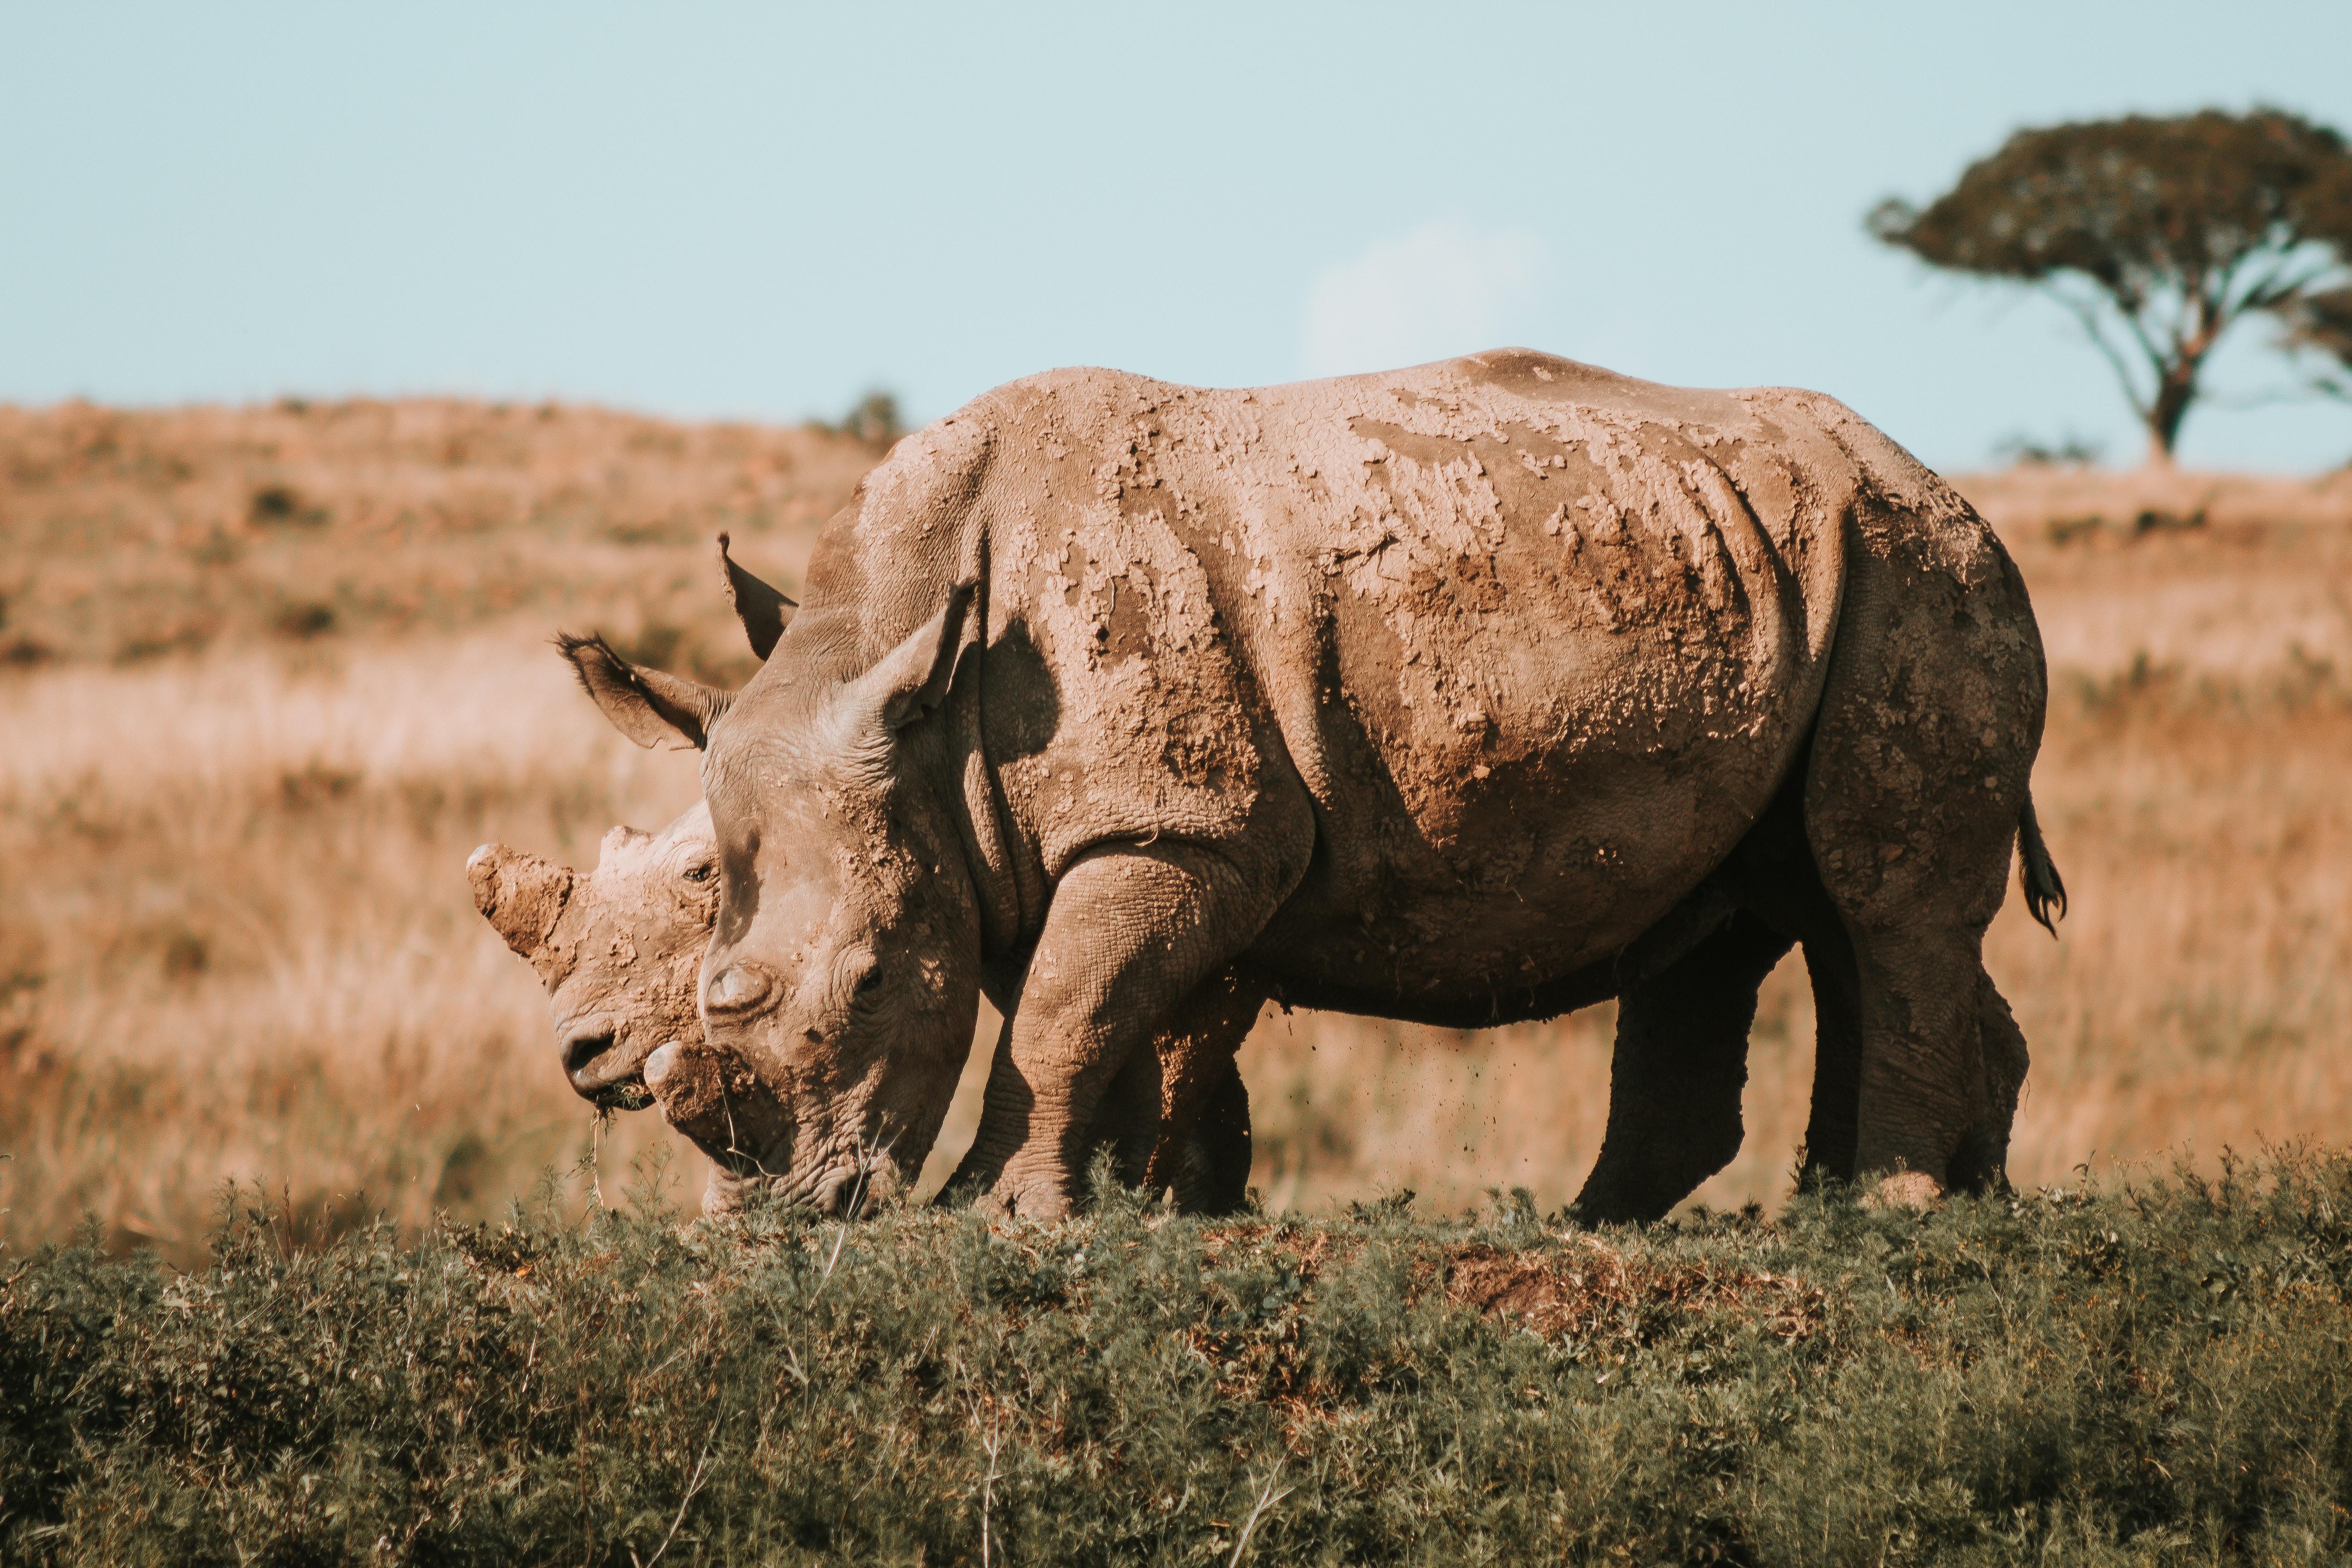 rhinoceros grazing